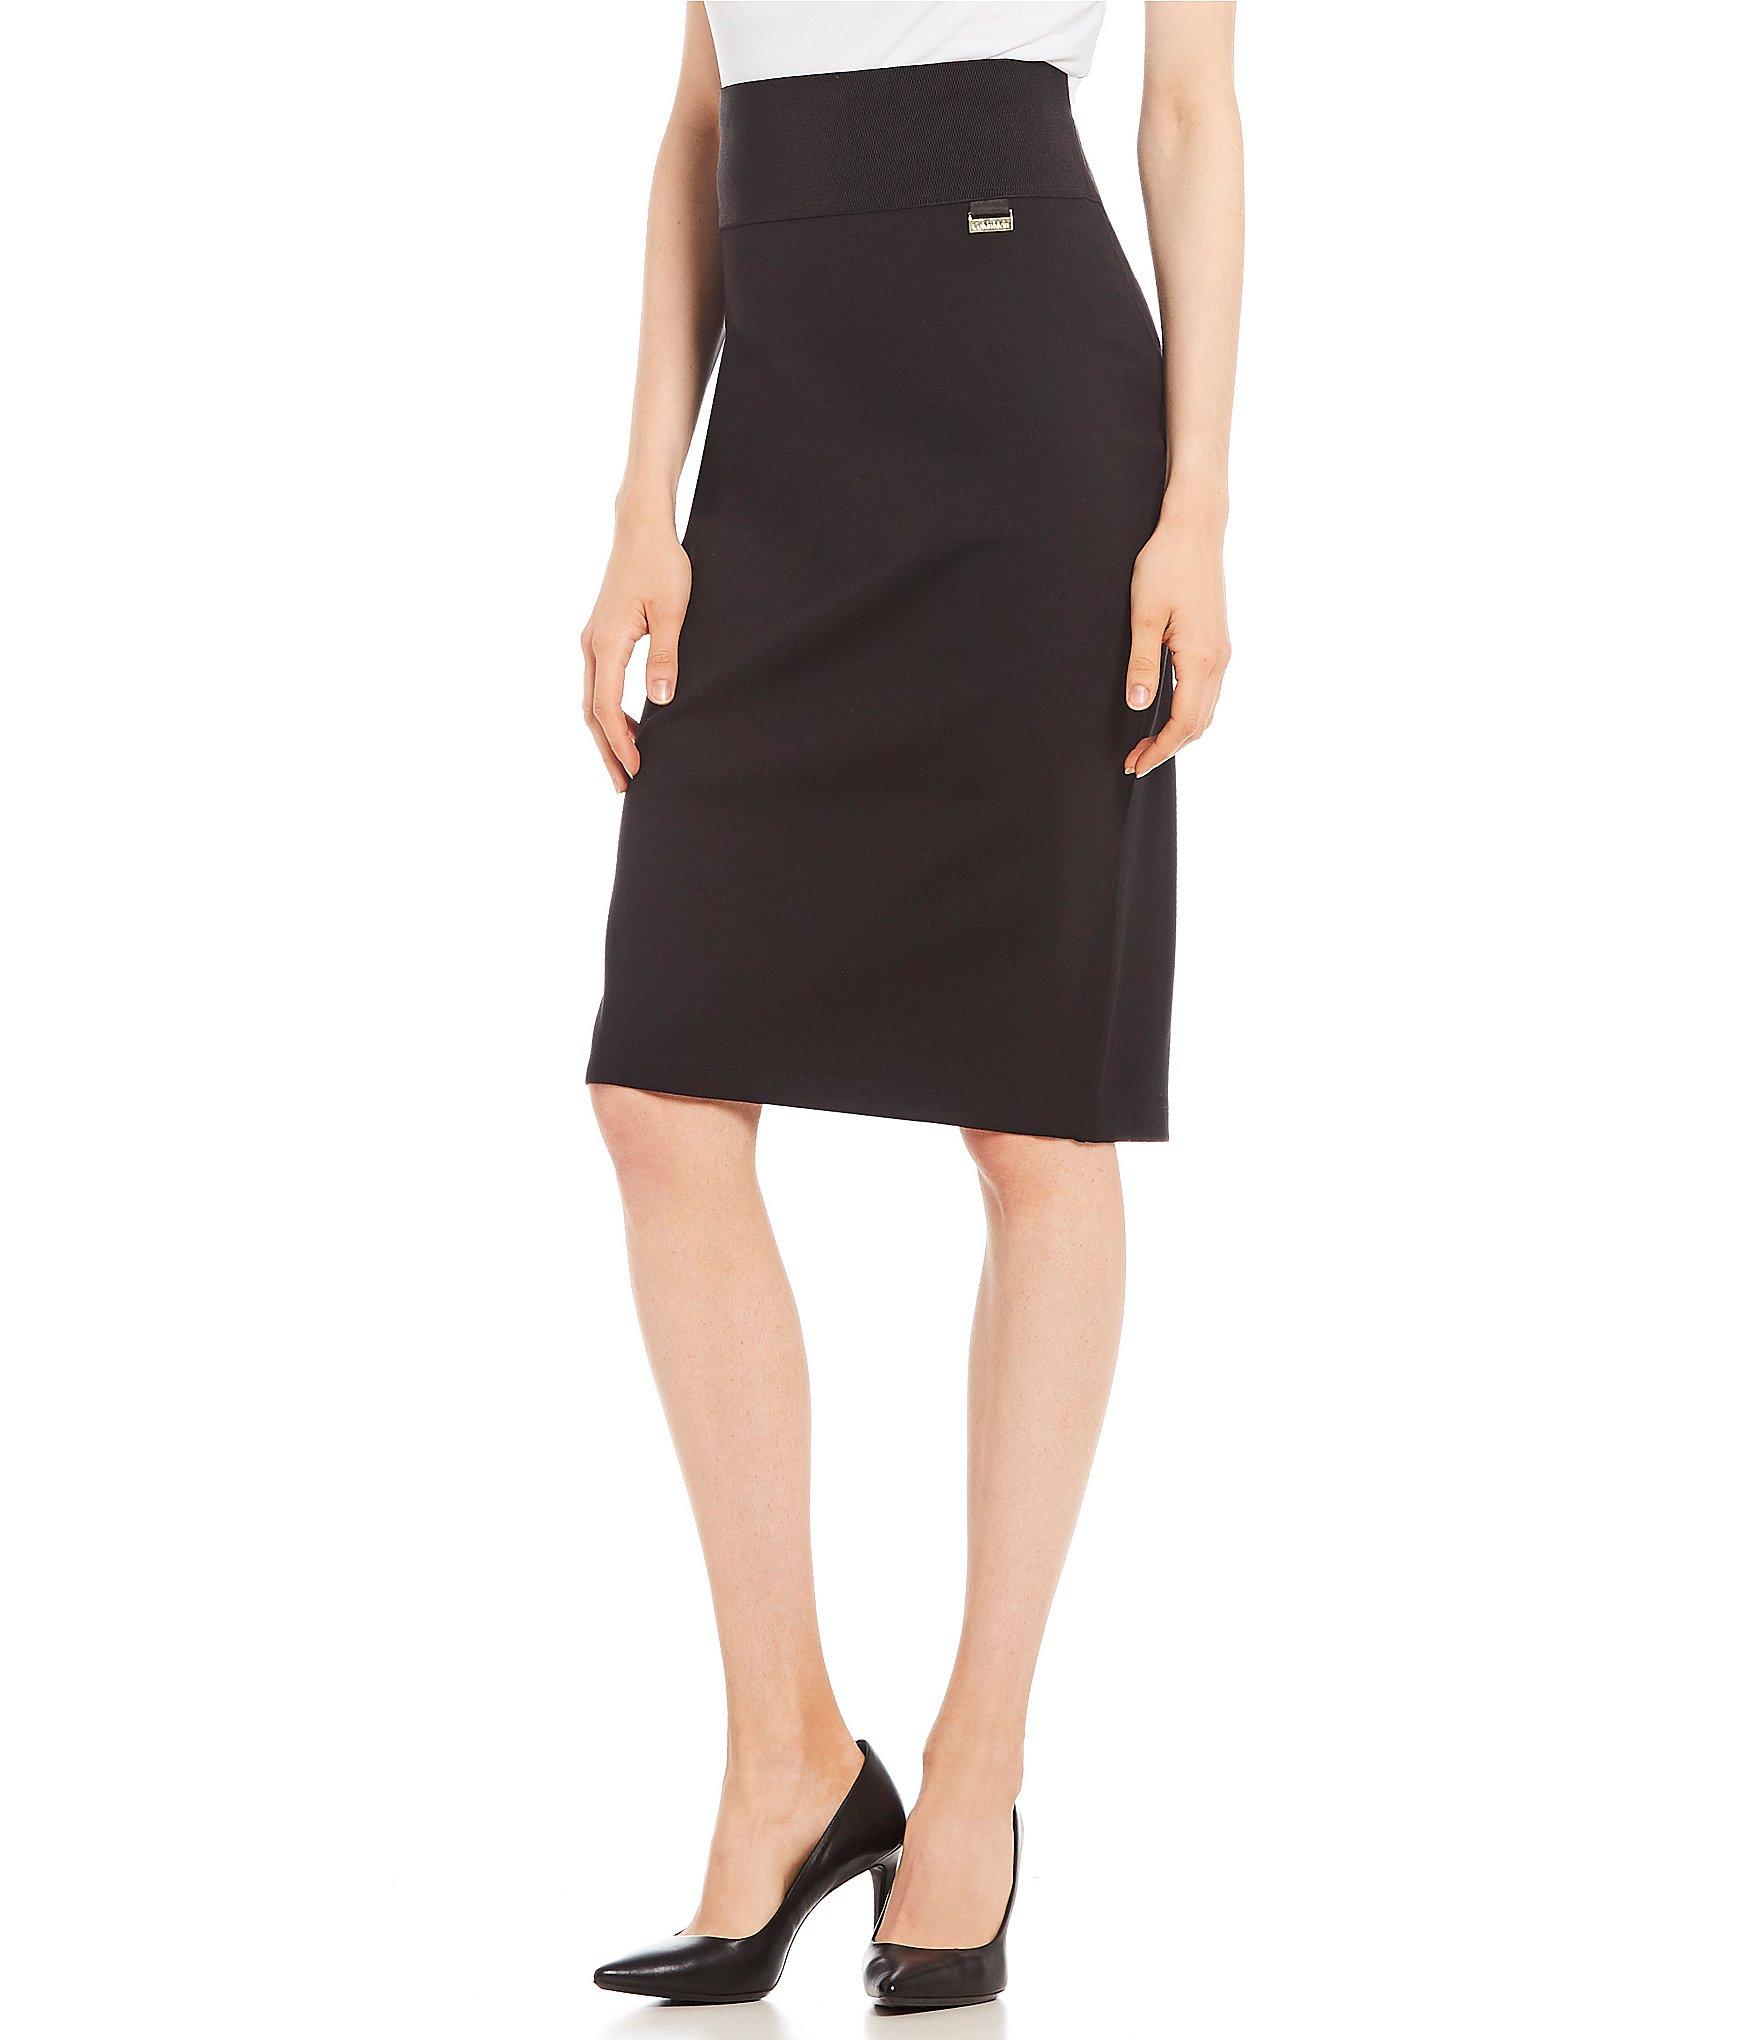 31f28e7bc4 black skirt: Women's Clothing & Apparel | Dillard's